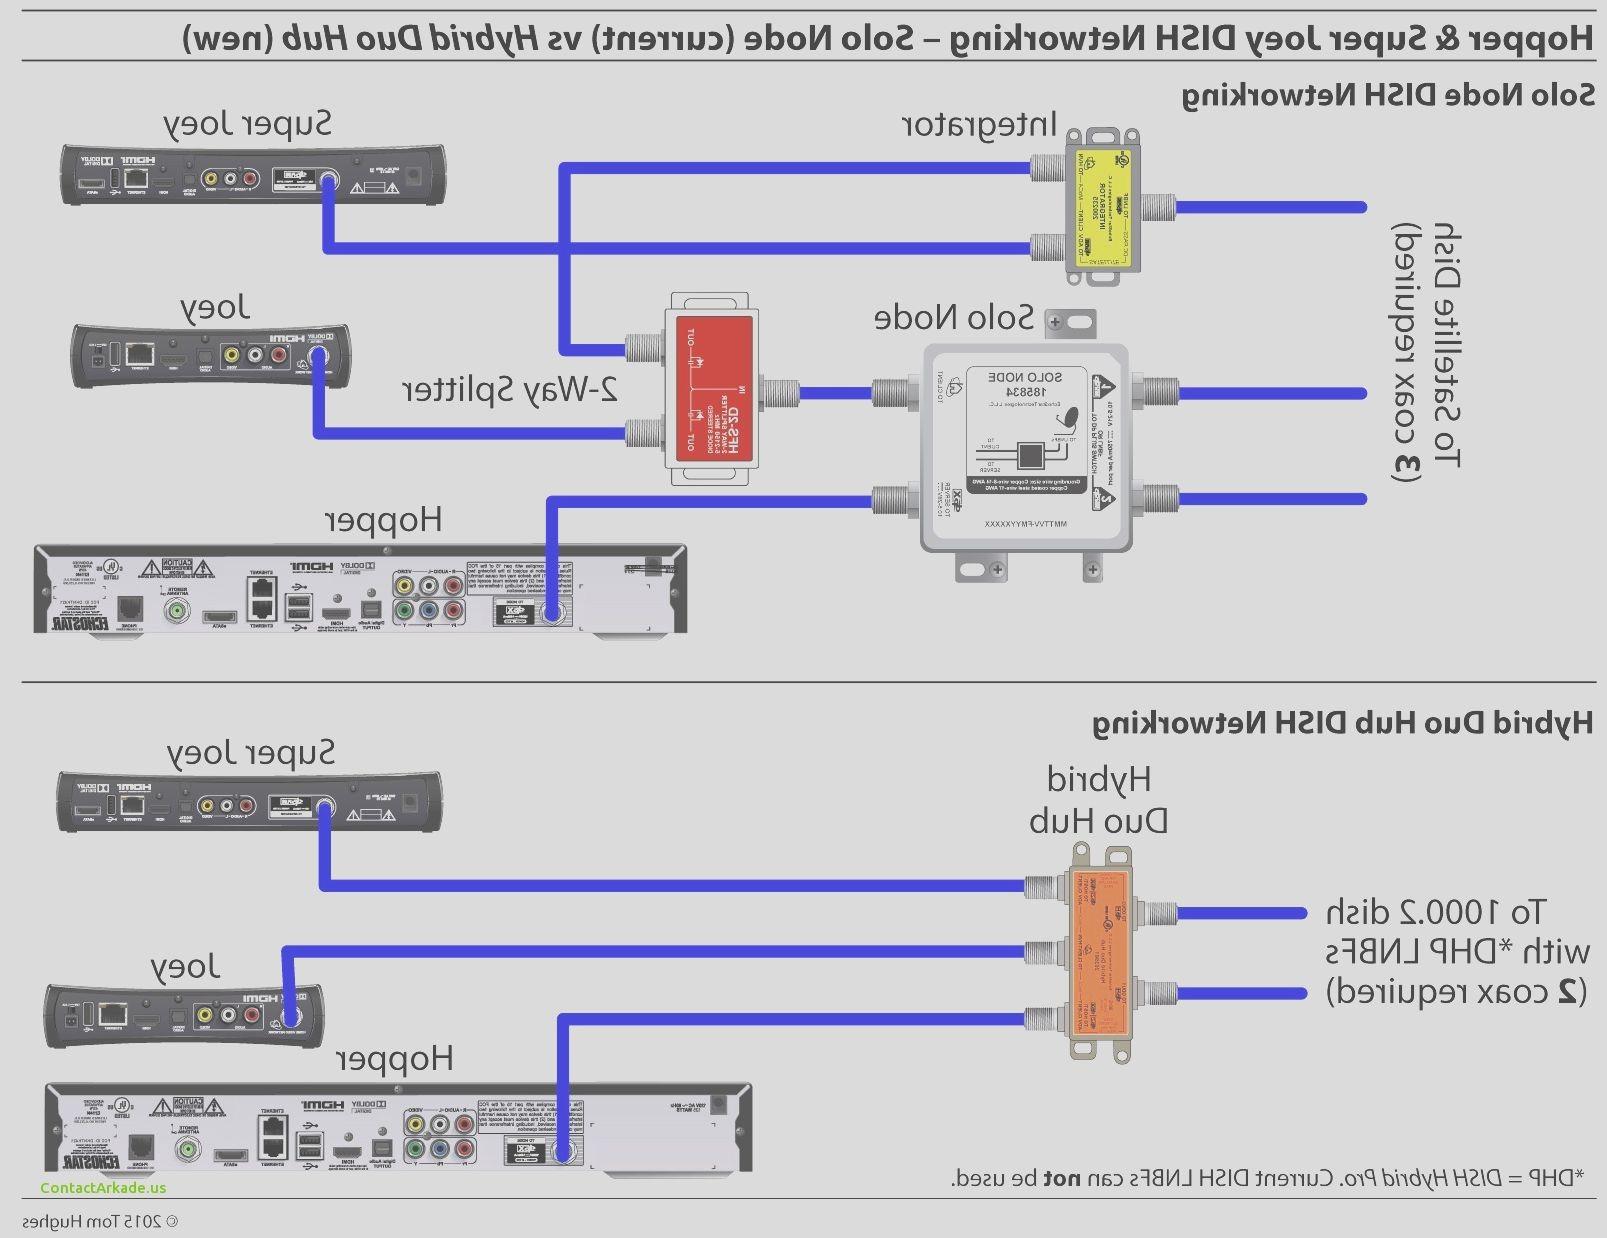 Dish Network Wiring Diagram Copy att Uverse Wiring Diagram Lovely Dish Network Wiring Diagrams